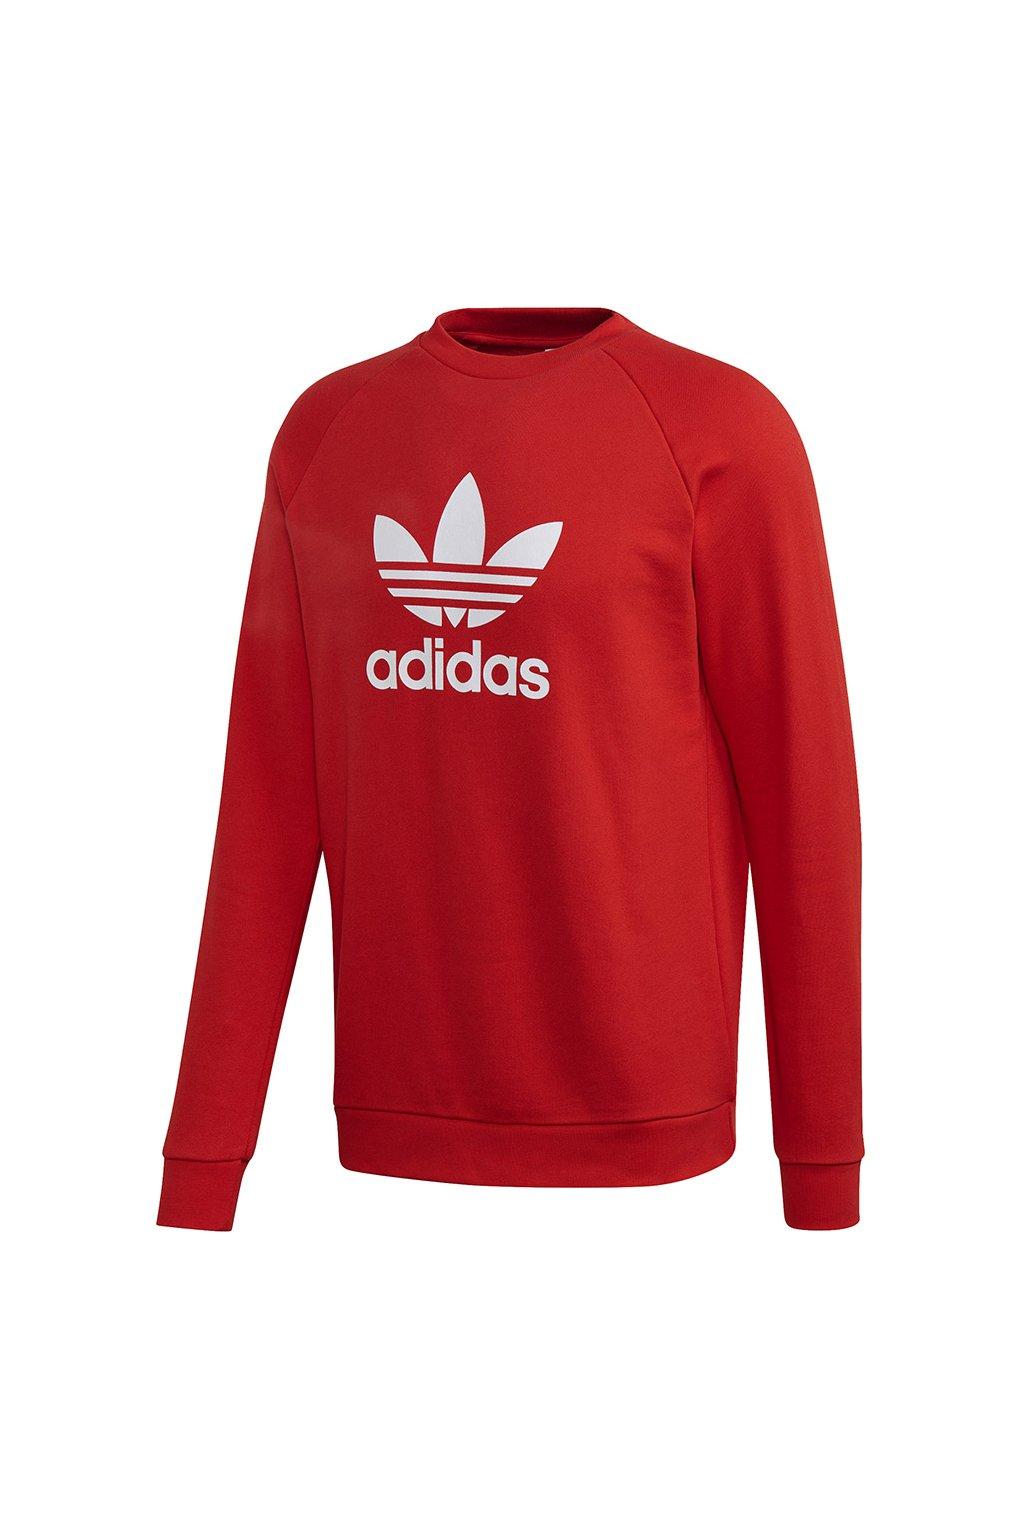 Pánska mikina Adidas Trefoil Crew červená FM3781